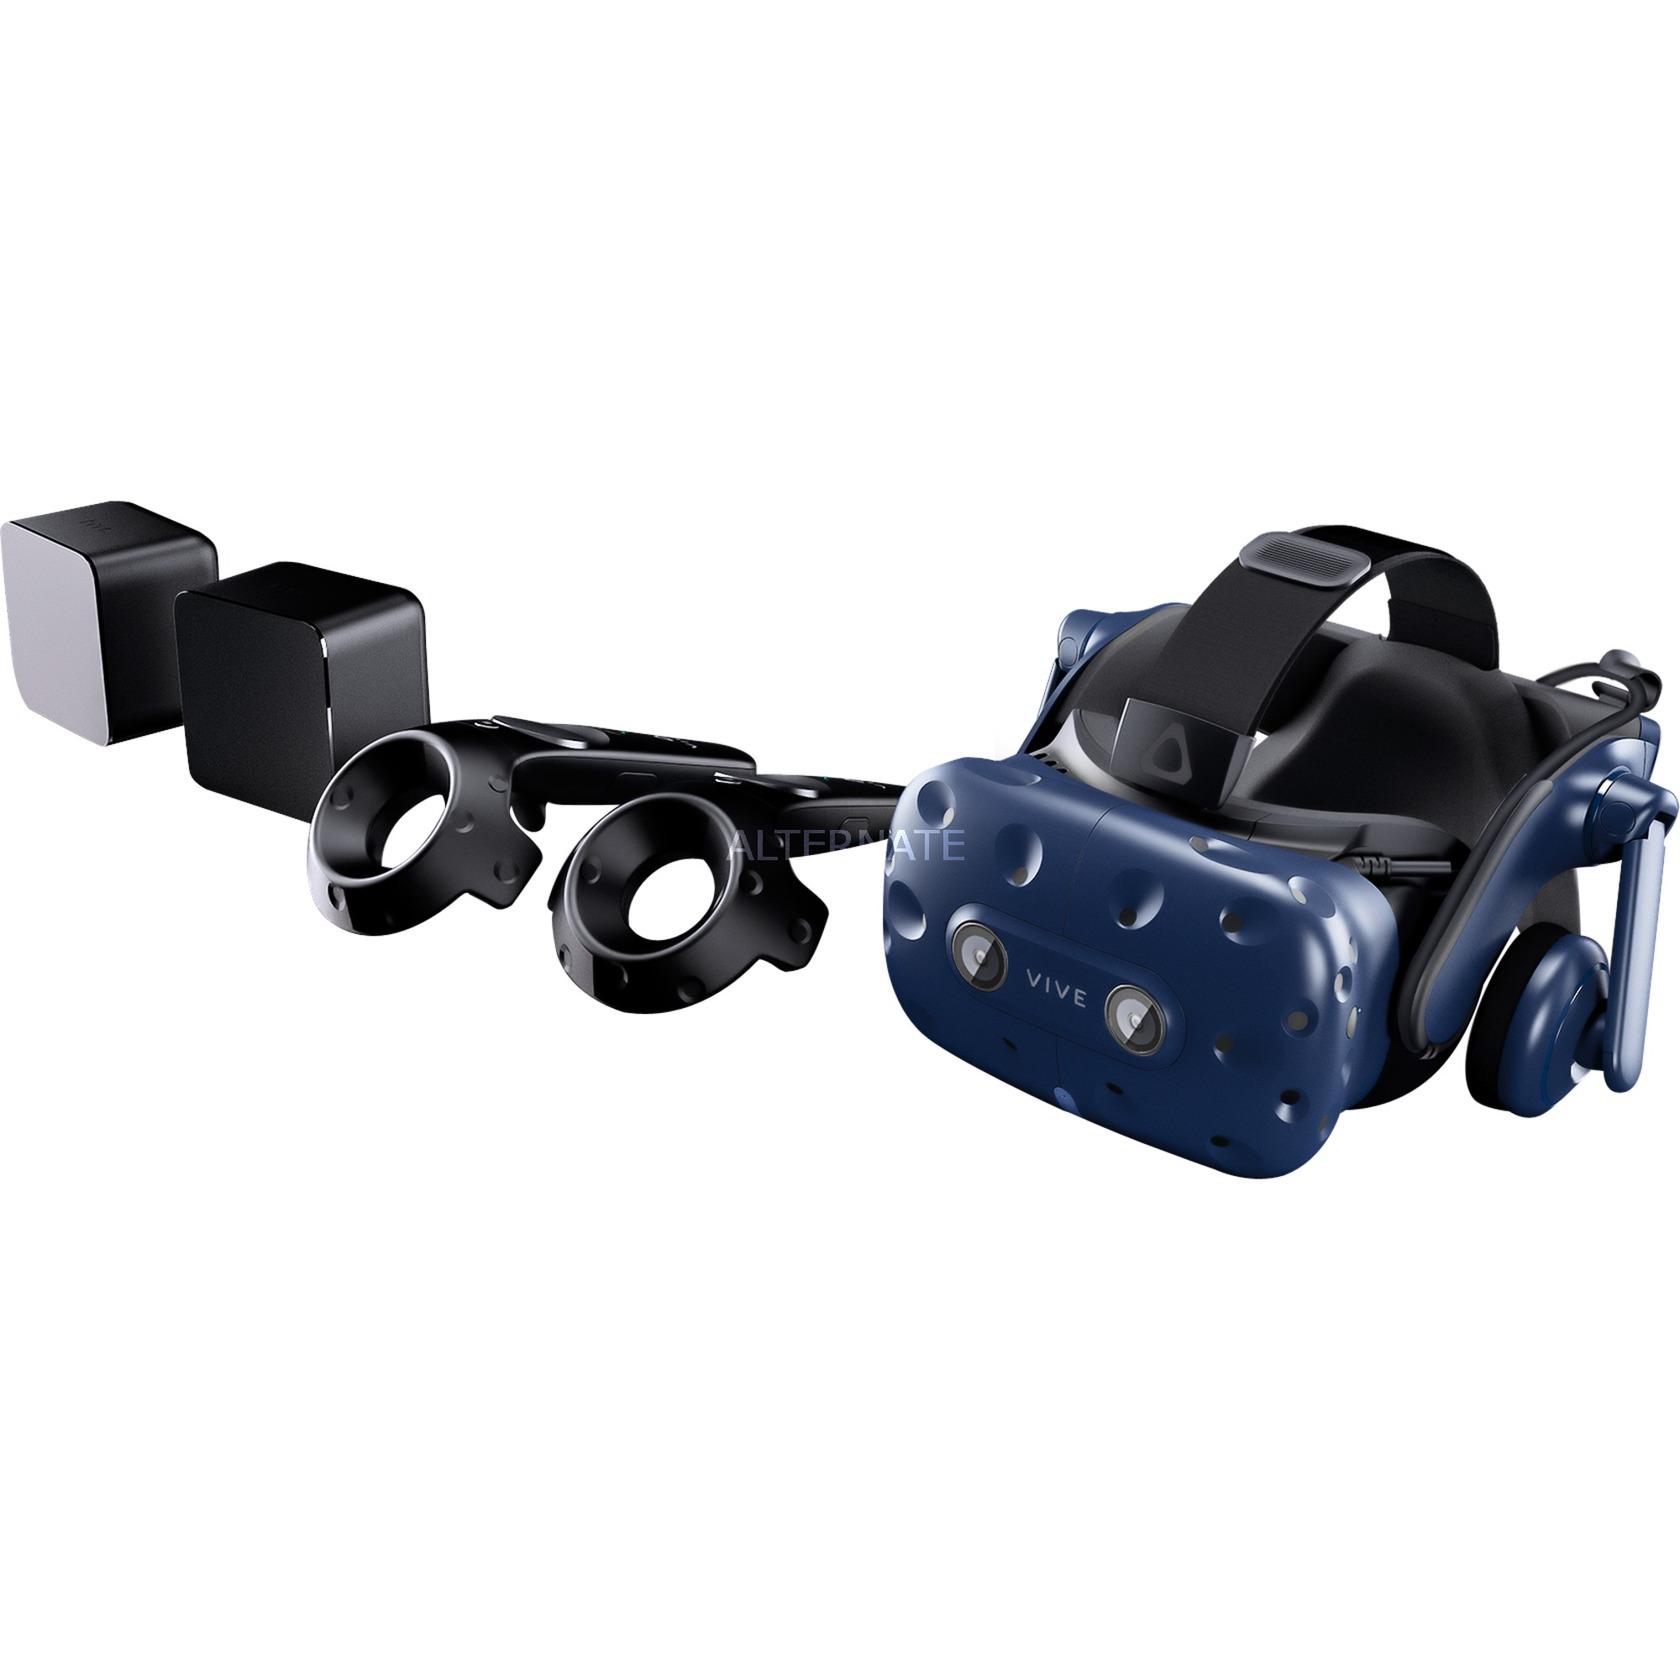 Vive Pro (Starter Kit), Gafas de Realidad Virtual (VR)